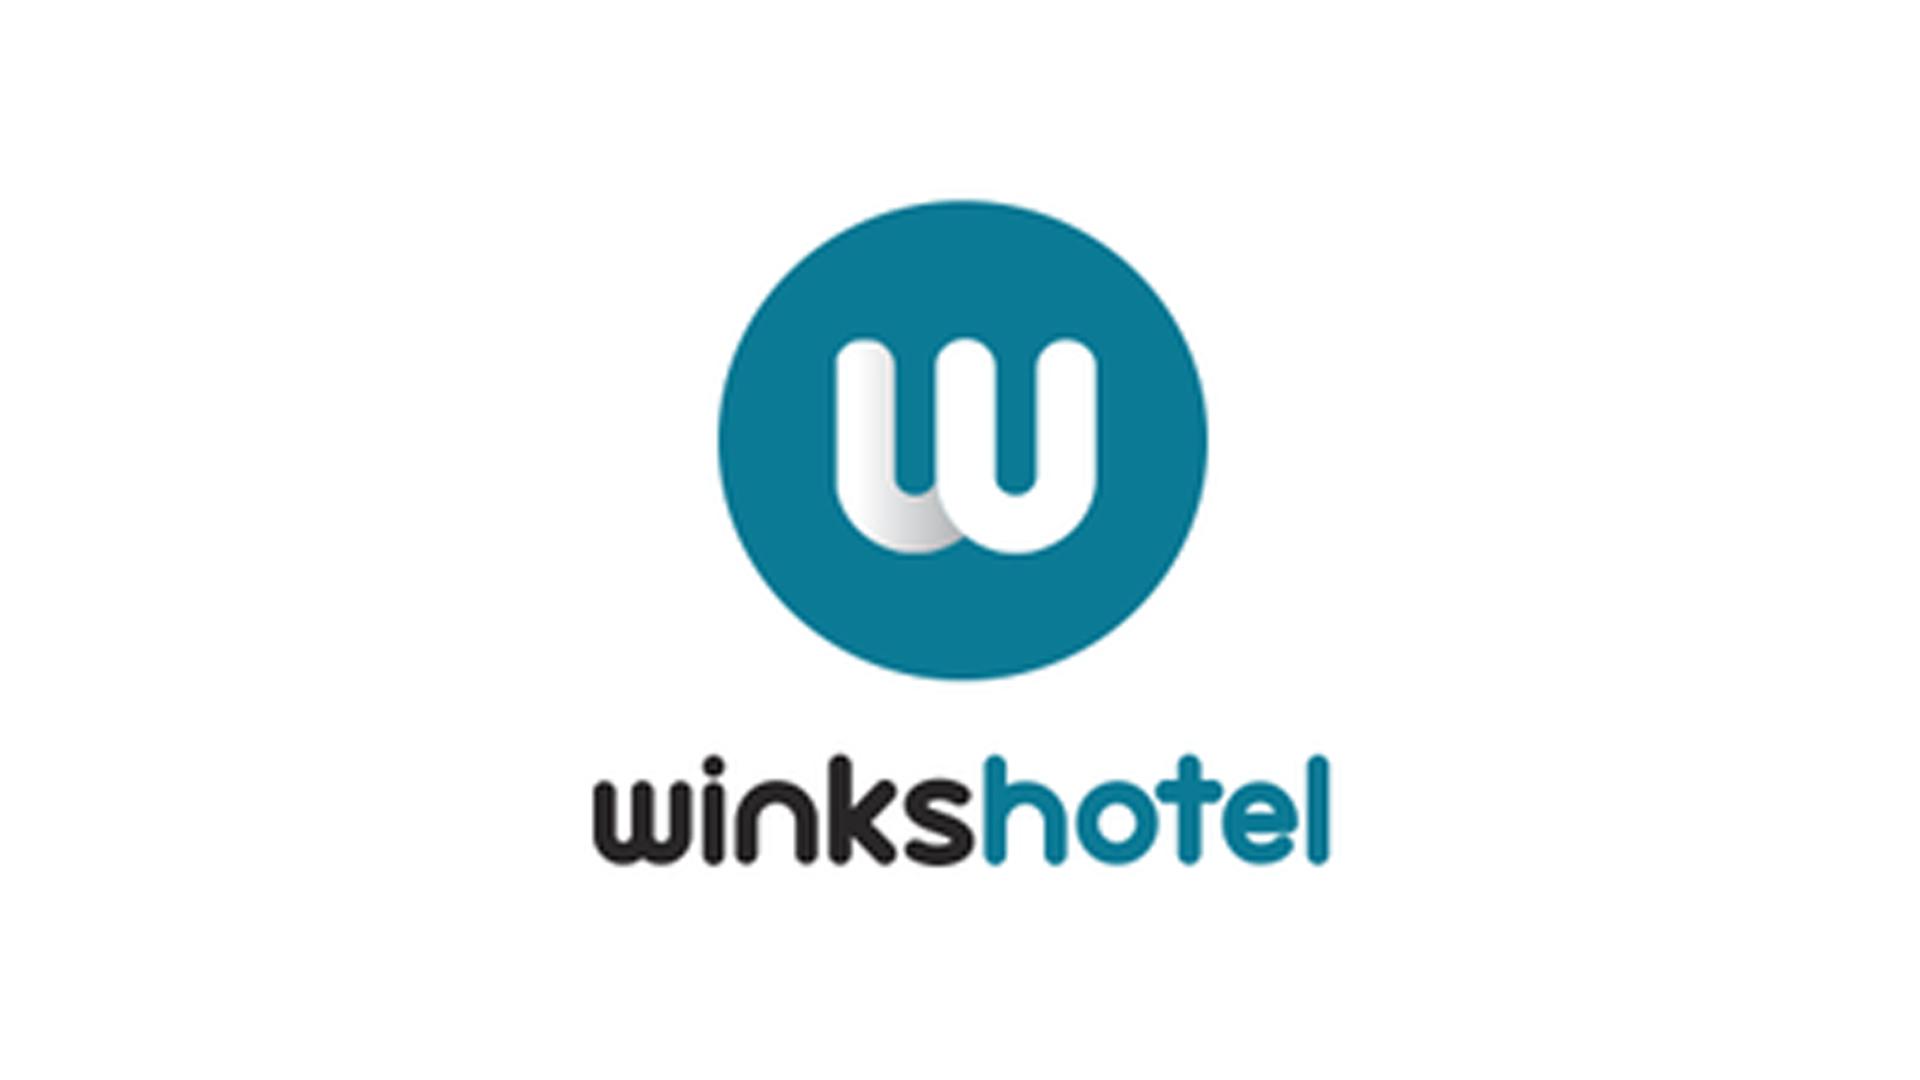 Winkshotel PMS logo